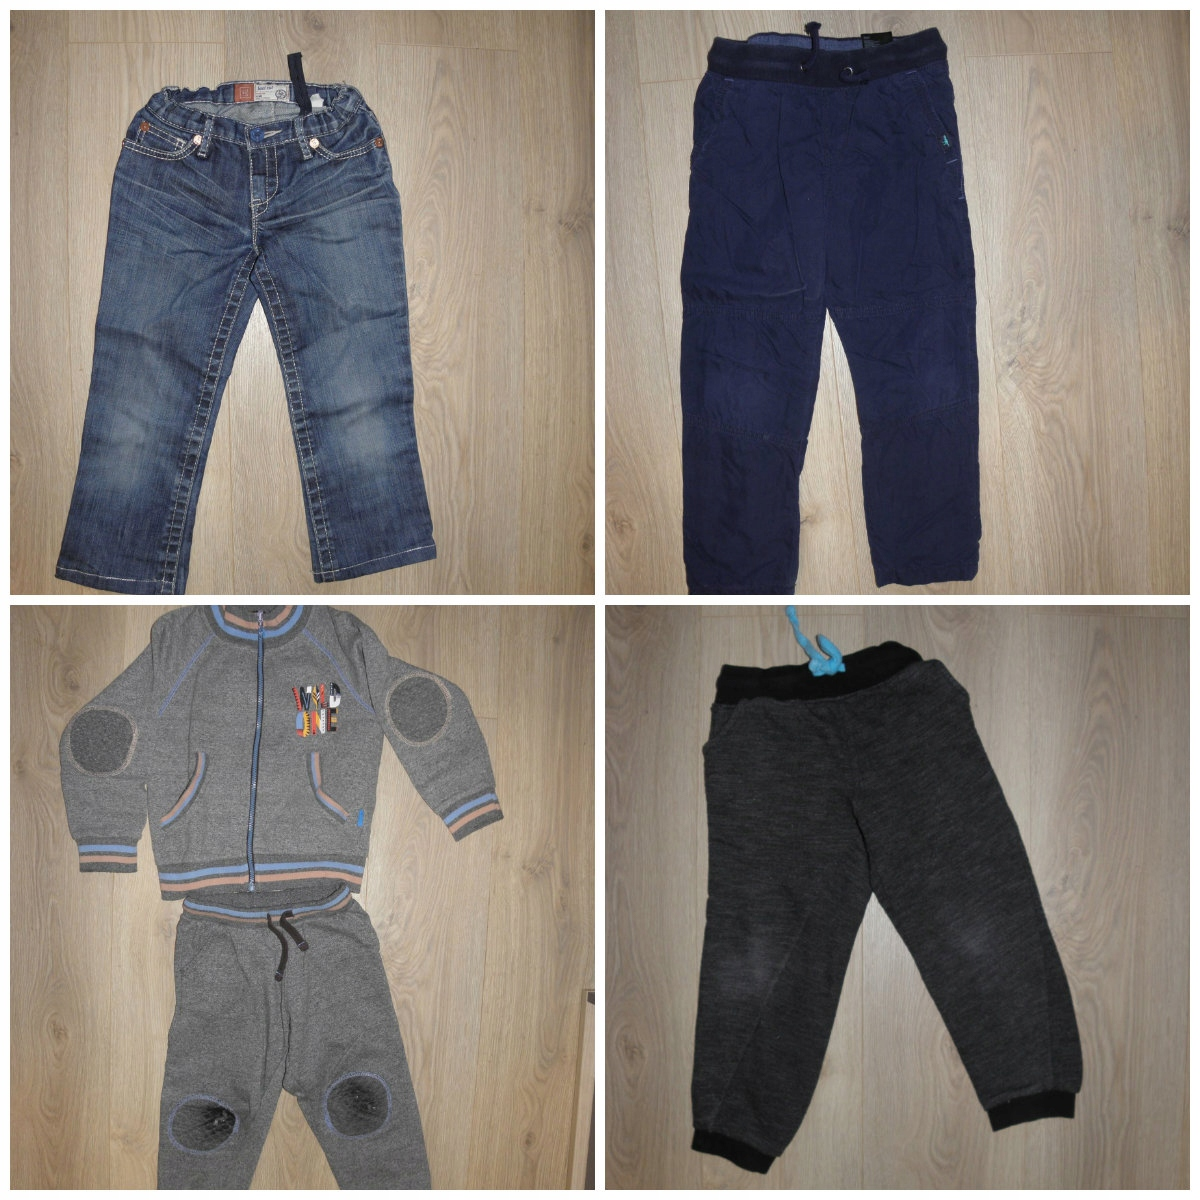 Zestaw ubrań 116  122cm - 5  6 lat